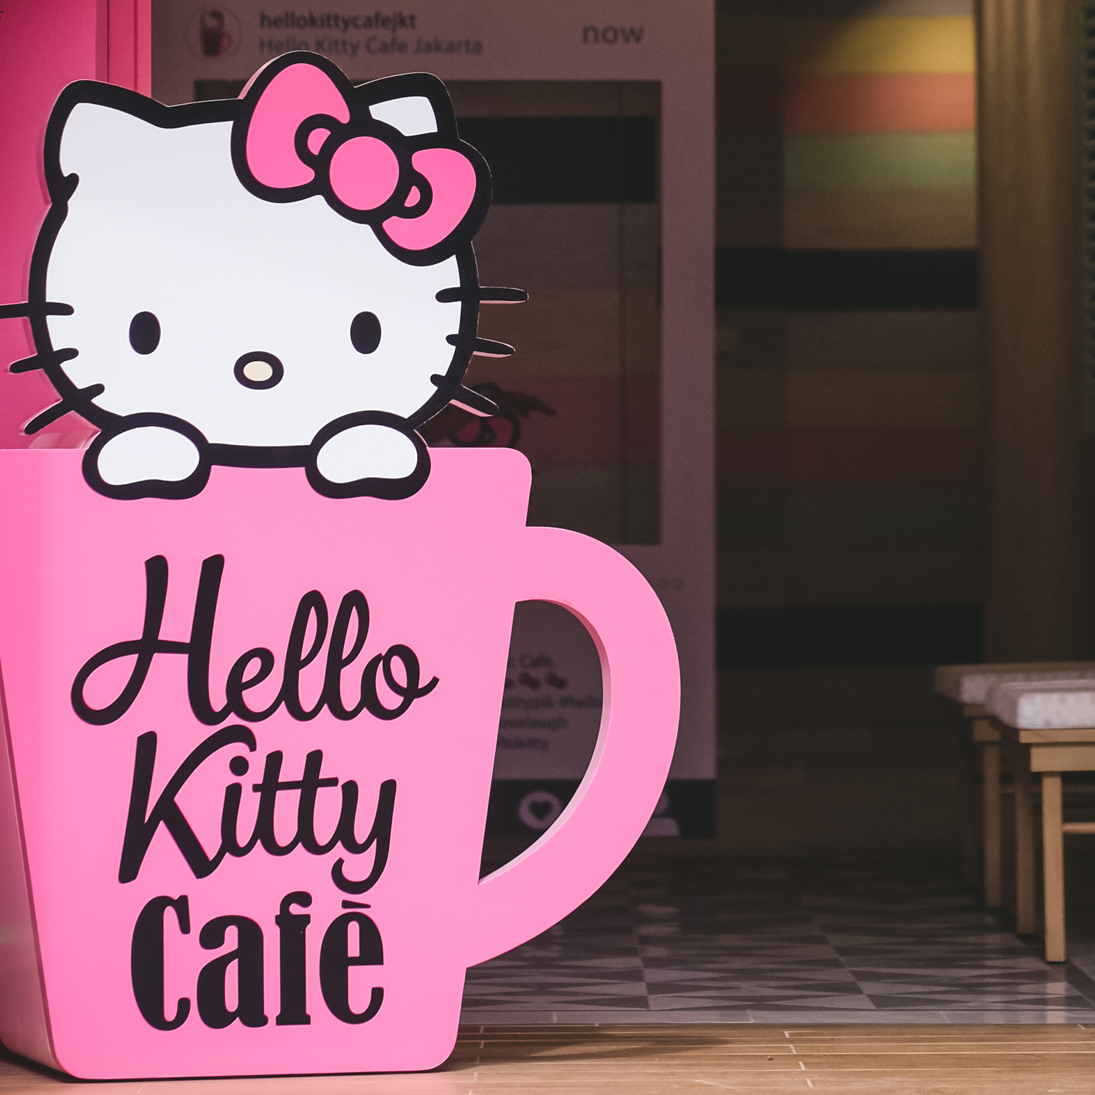 Fantastic Wallpaper Hello Kitty Coffee - HELLO%2BKITTY%2BCAFE%2BJAKARTA-31  Best Photo Reference_539094.JPG